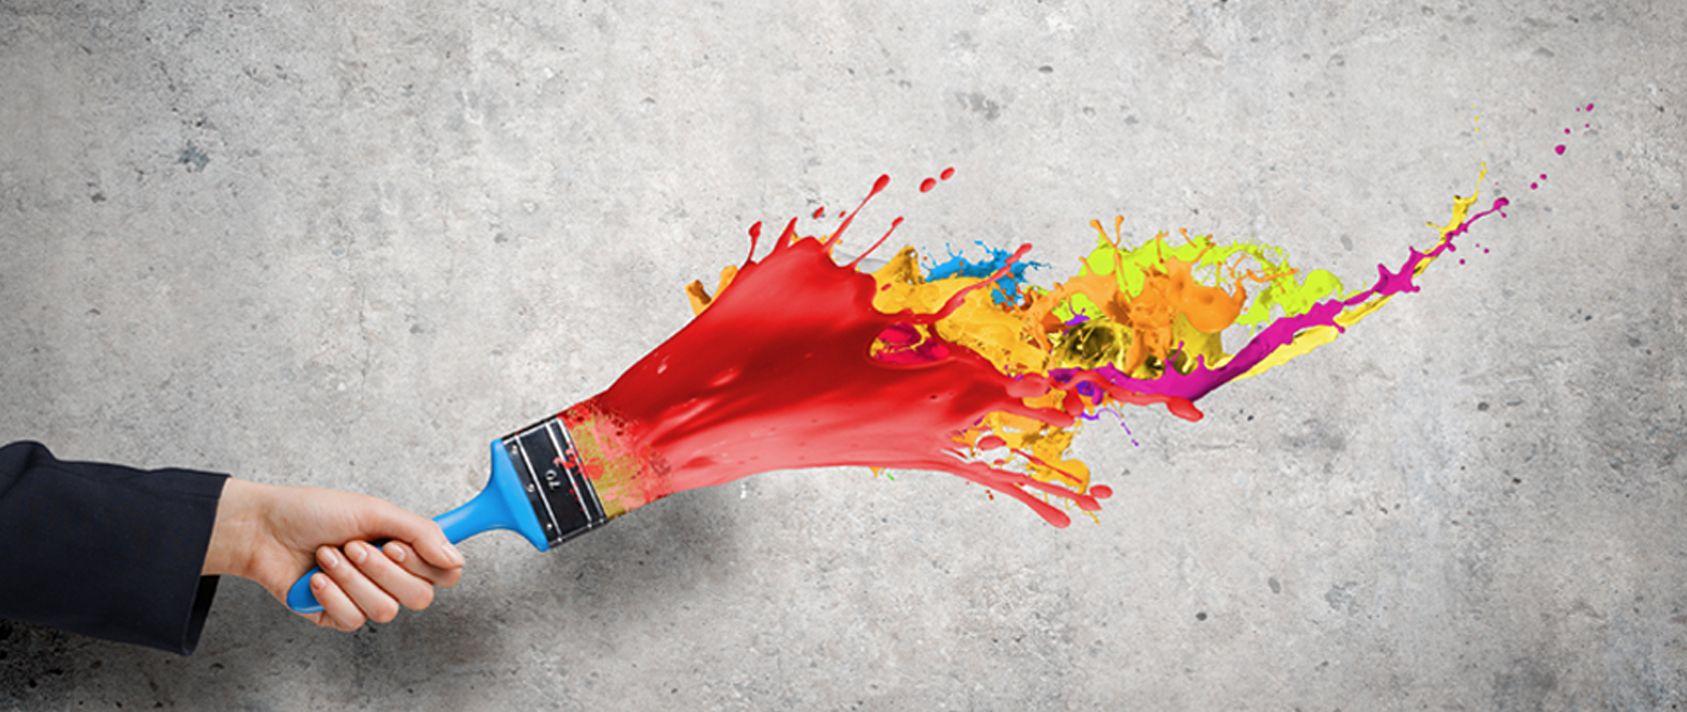 graphic design assignments ideas